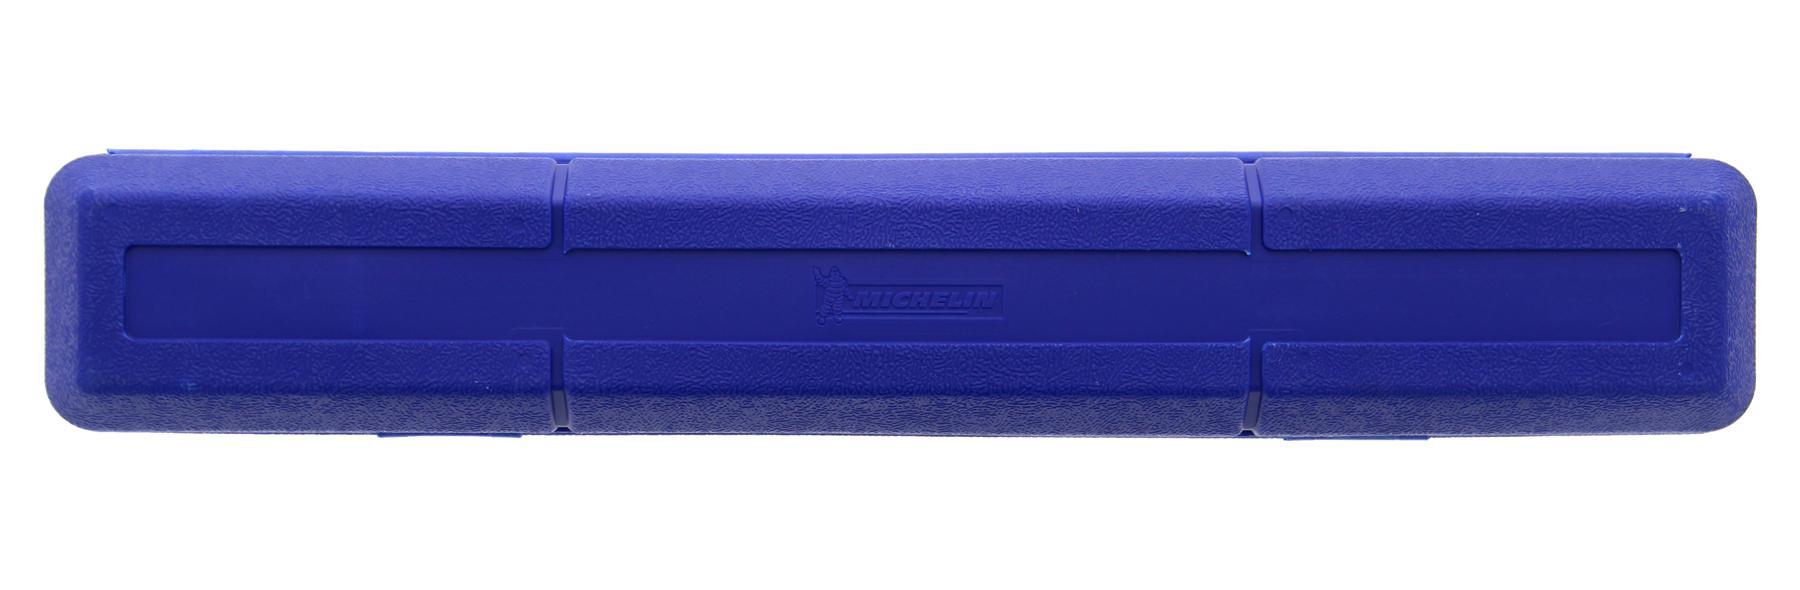 Michelin Art. Nr 008522 günstig